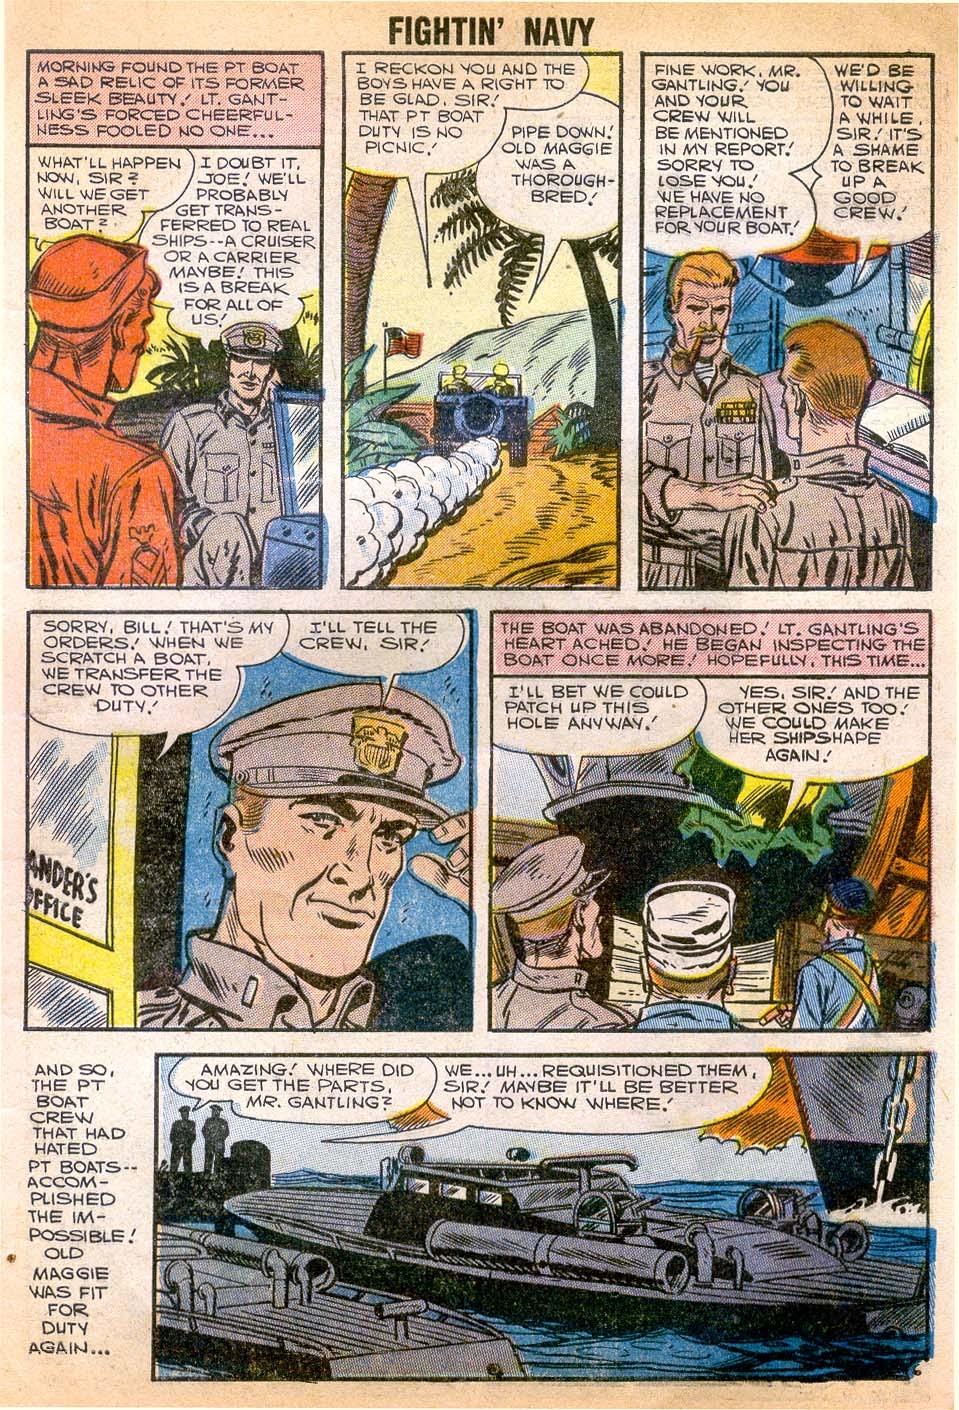 Read online Fightin' Navy comic -  Issue #79 - 9